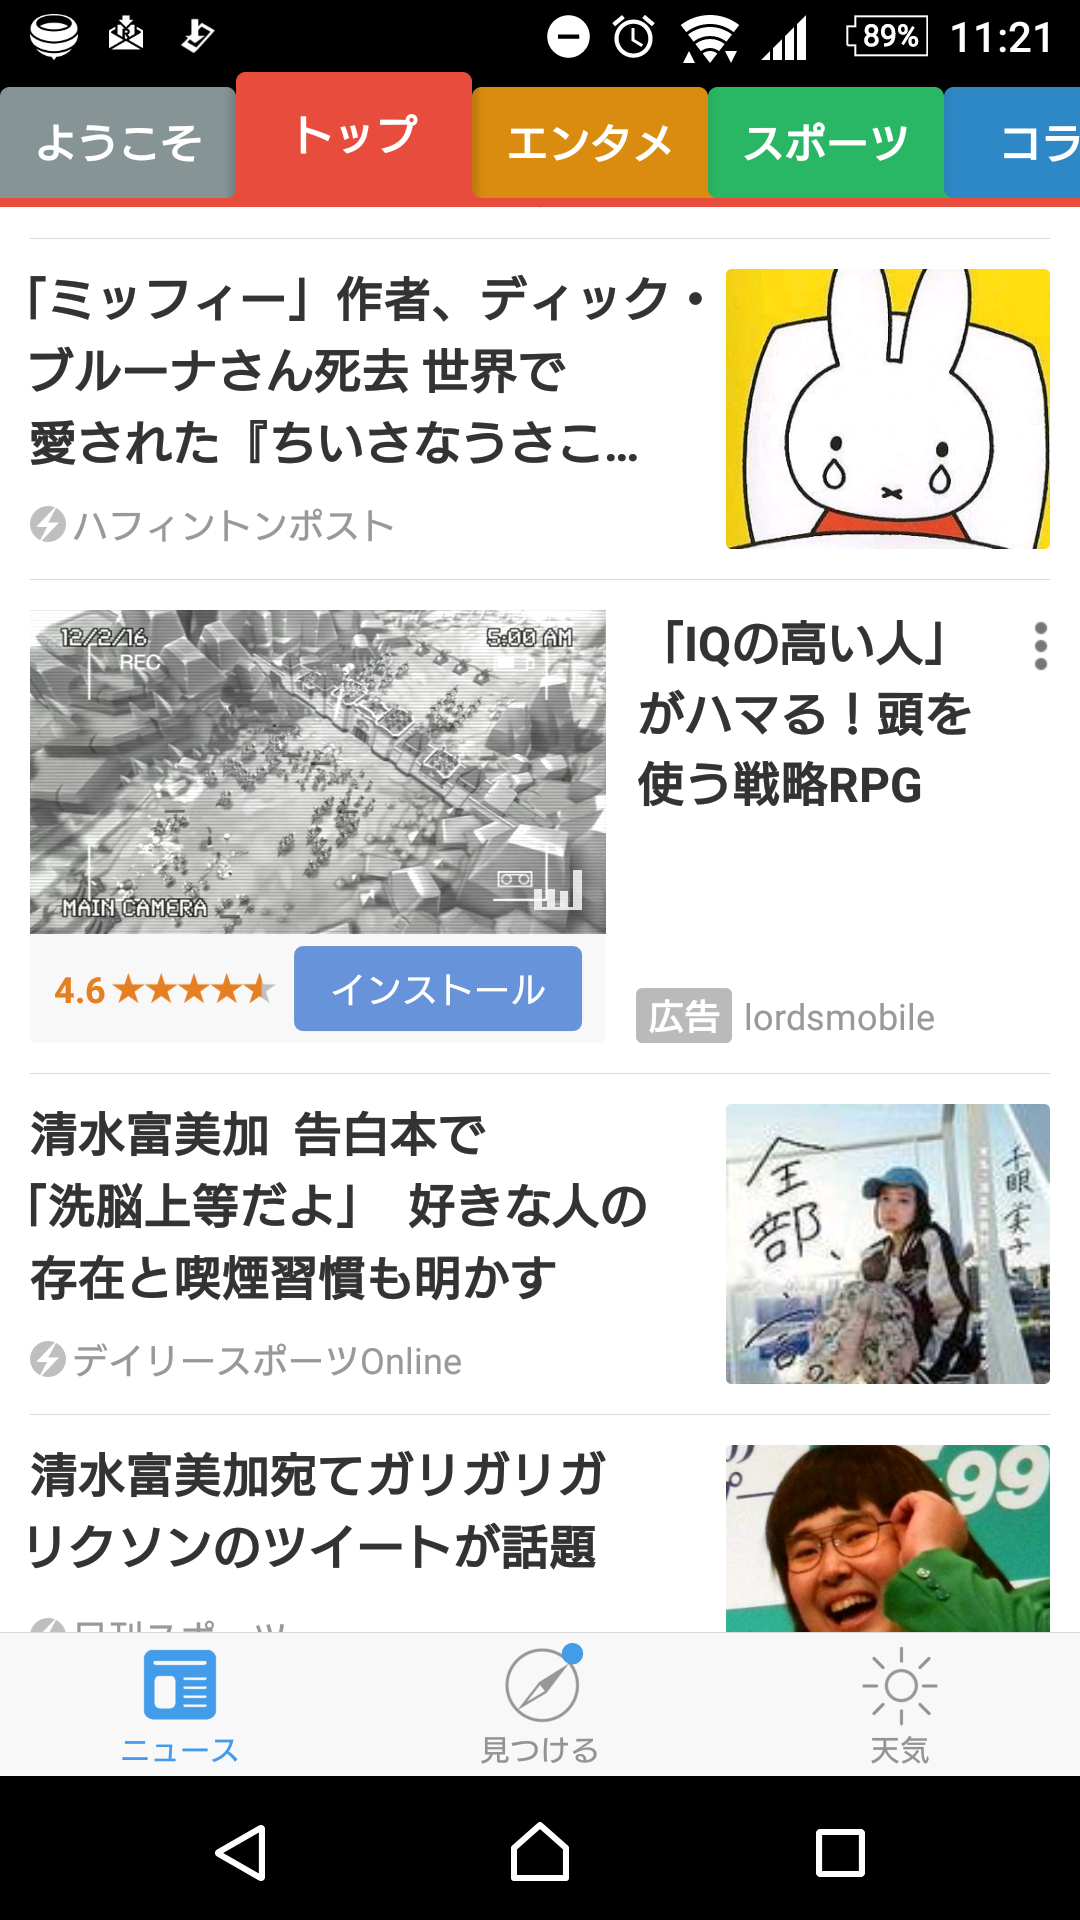 Screenshot_20170218-112134.png